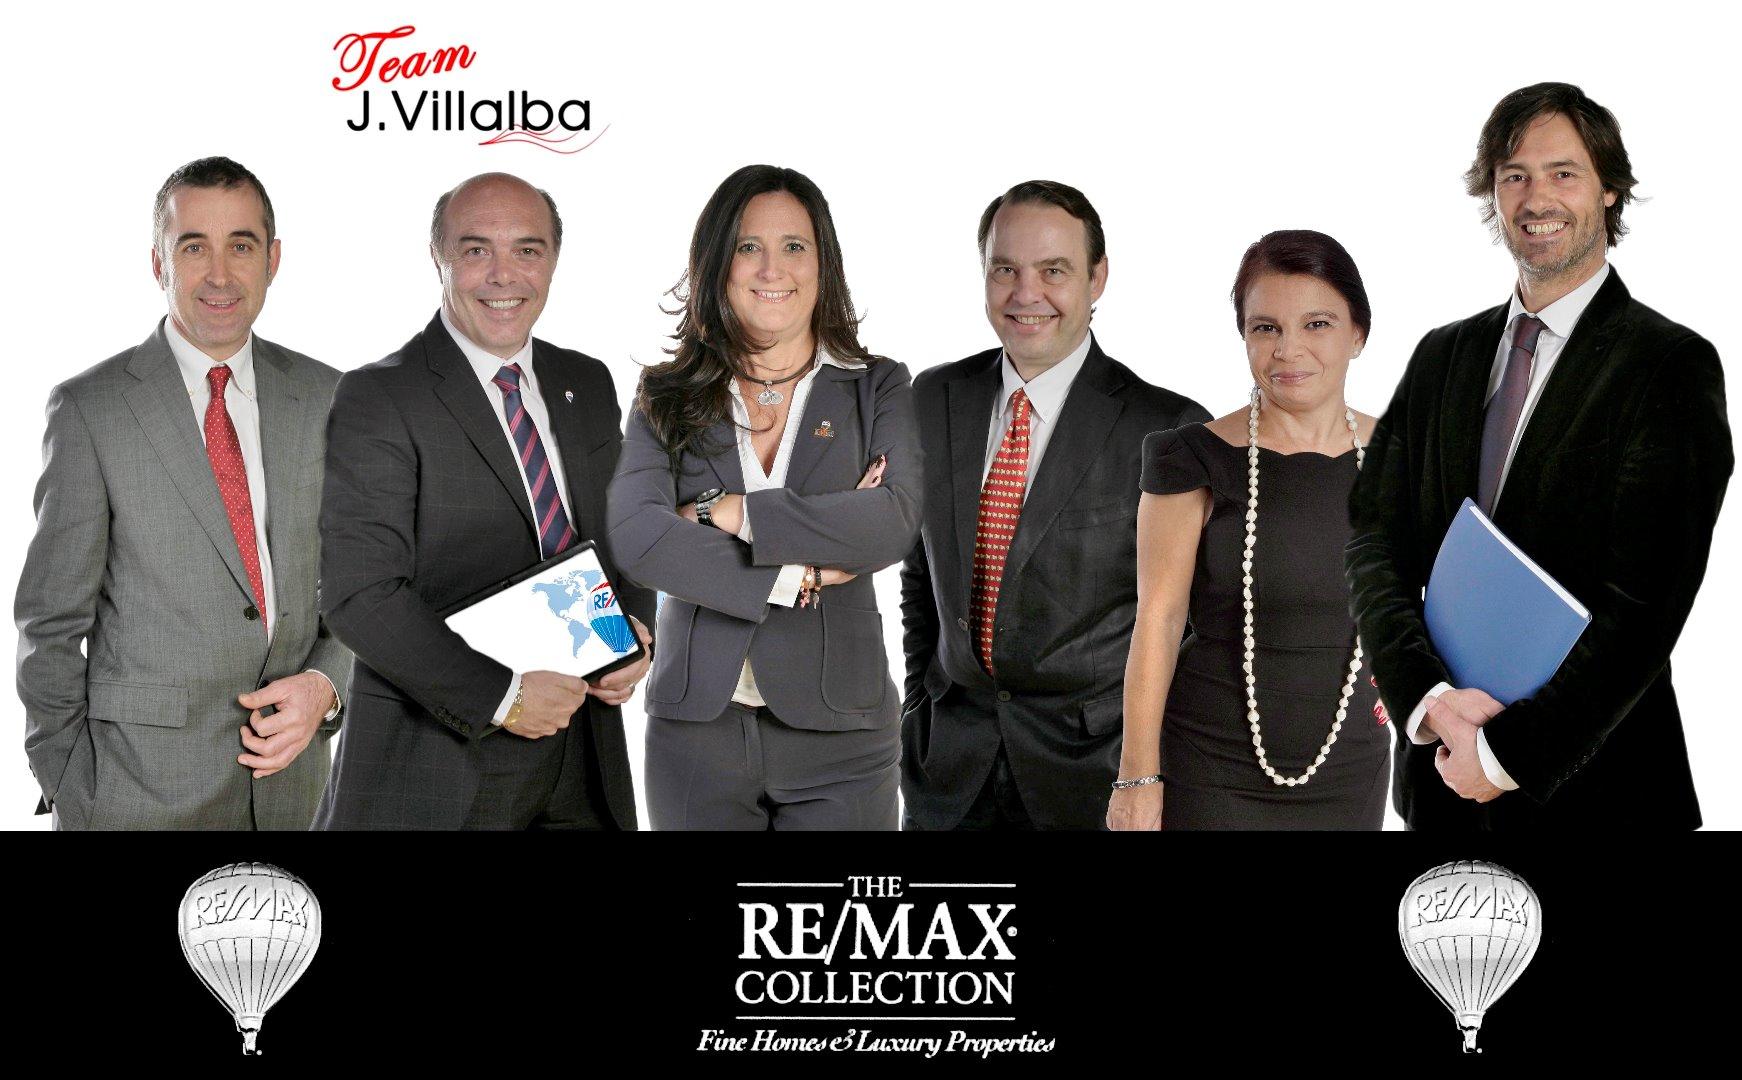 TEAM JAVIER VILLALBA REMAX - Agente inmobiliario